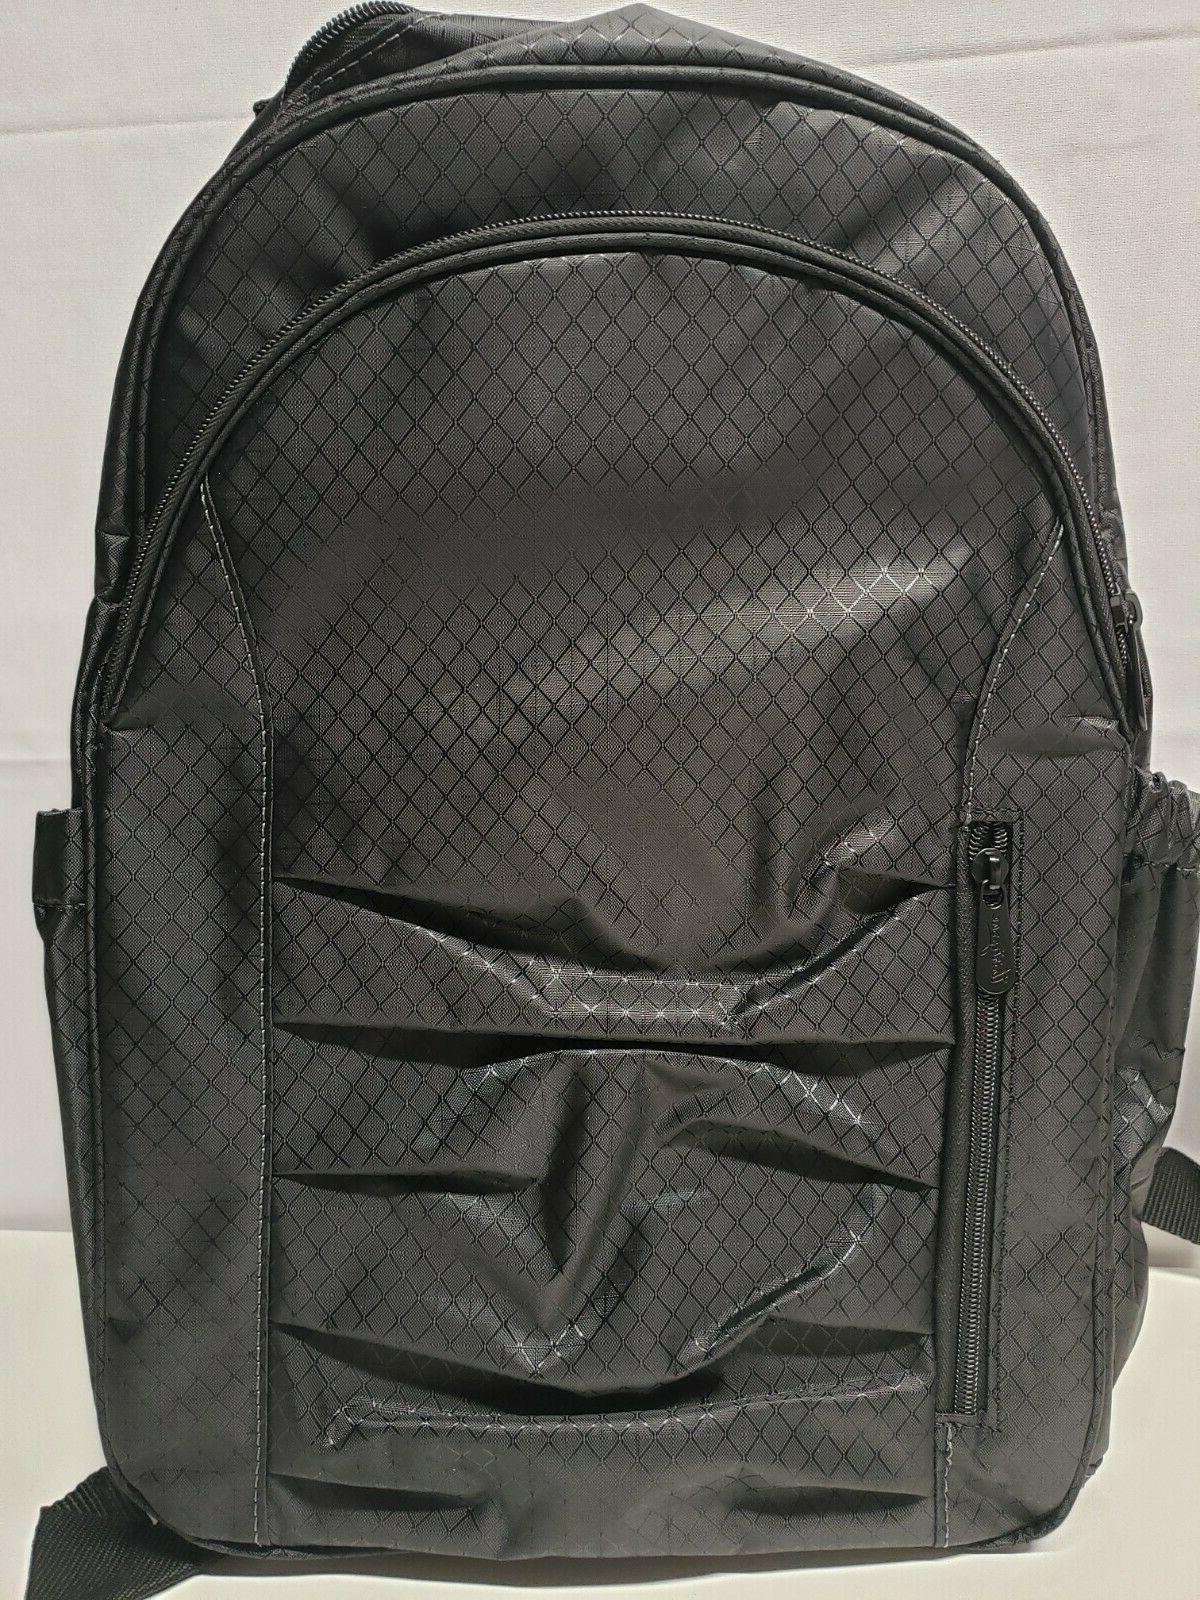 Thirty Black Her Deluxe Backpack W/ Mini Crossbody